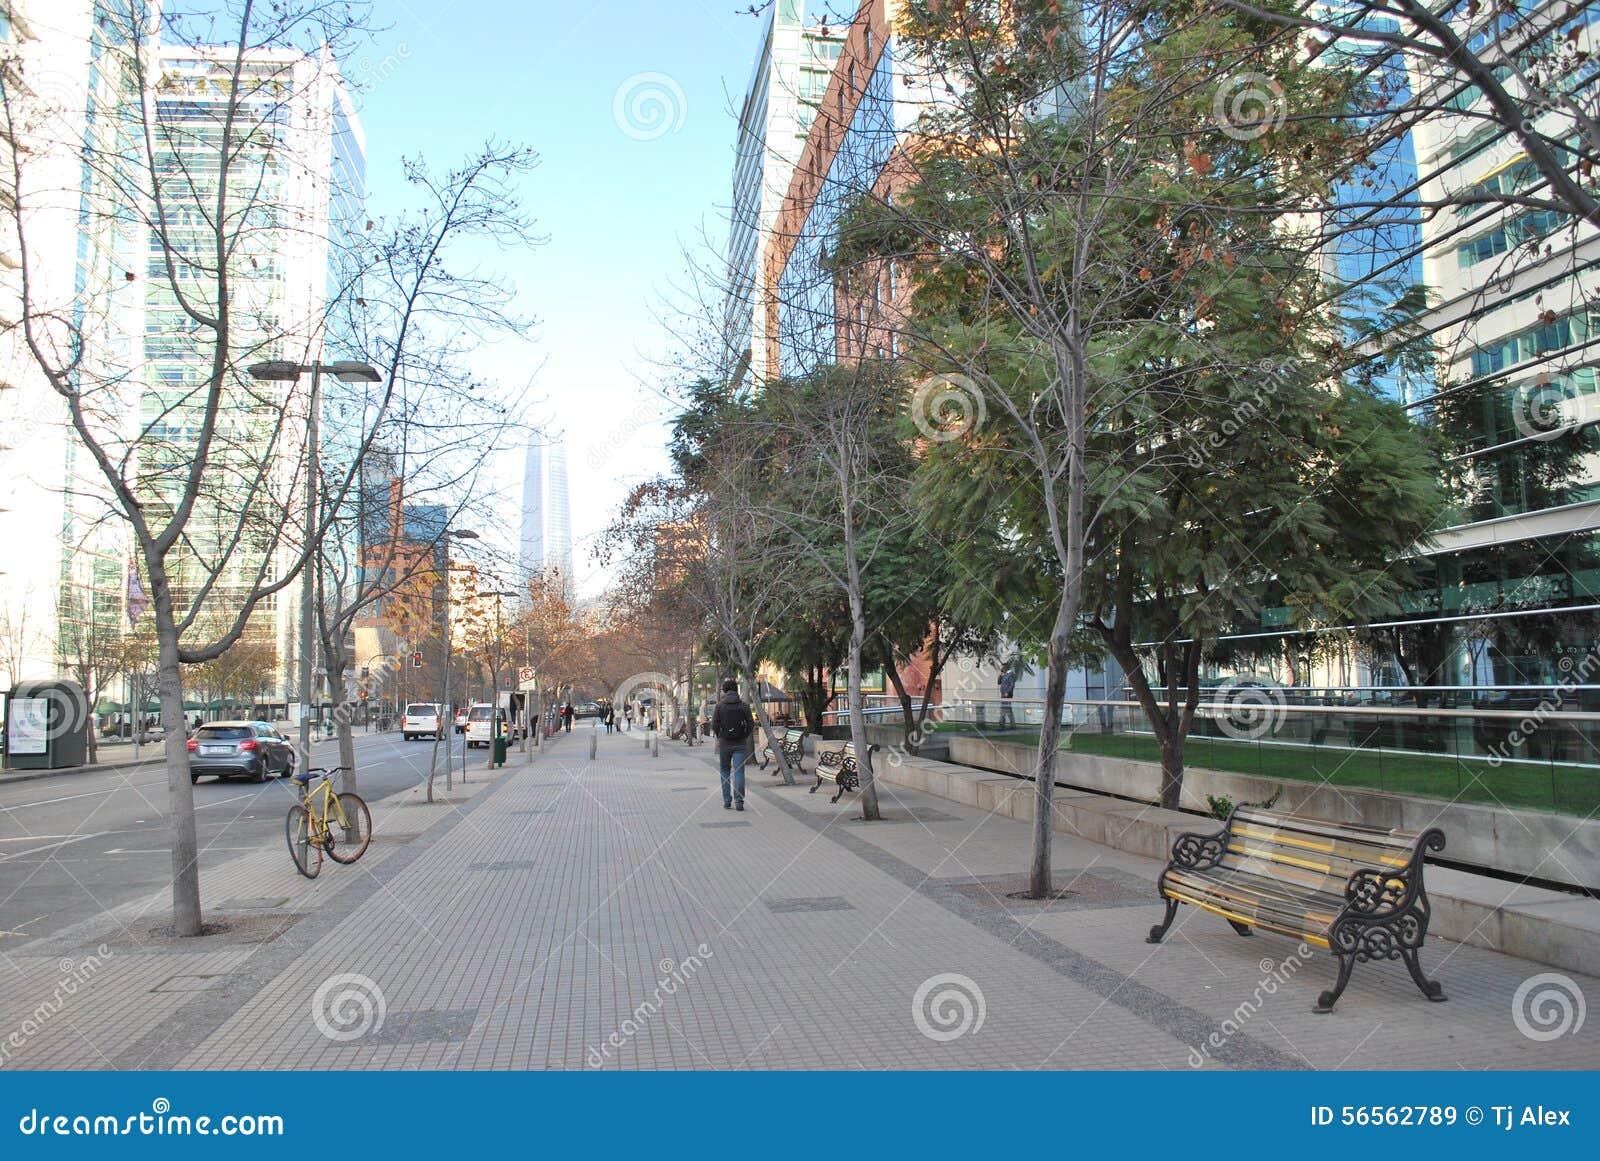 Download Καταπληκτικοί ουρανοξύστες στο Σαντιάγο, Χιλή Στοκ Εικόνα - εικόνα από τοπίο, ξενοδοχεία: 56562789